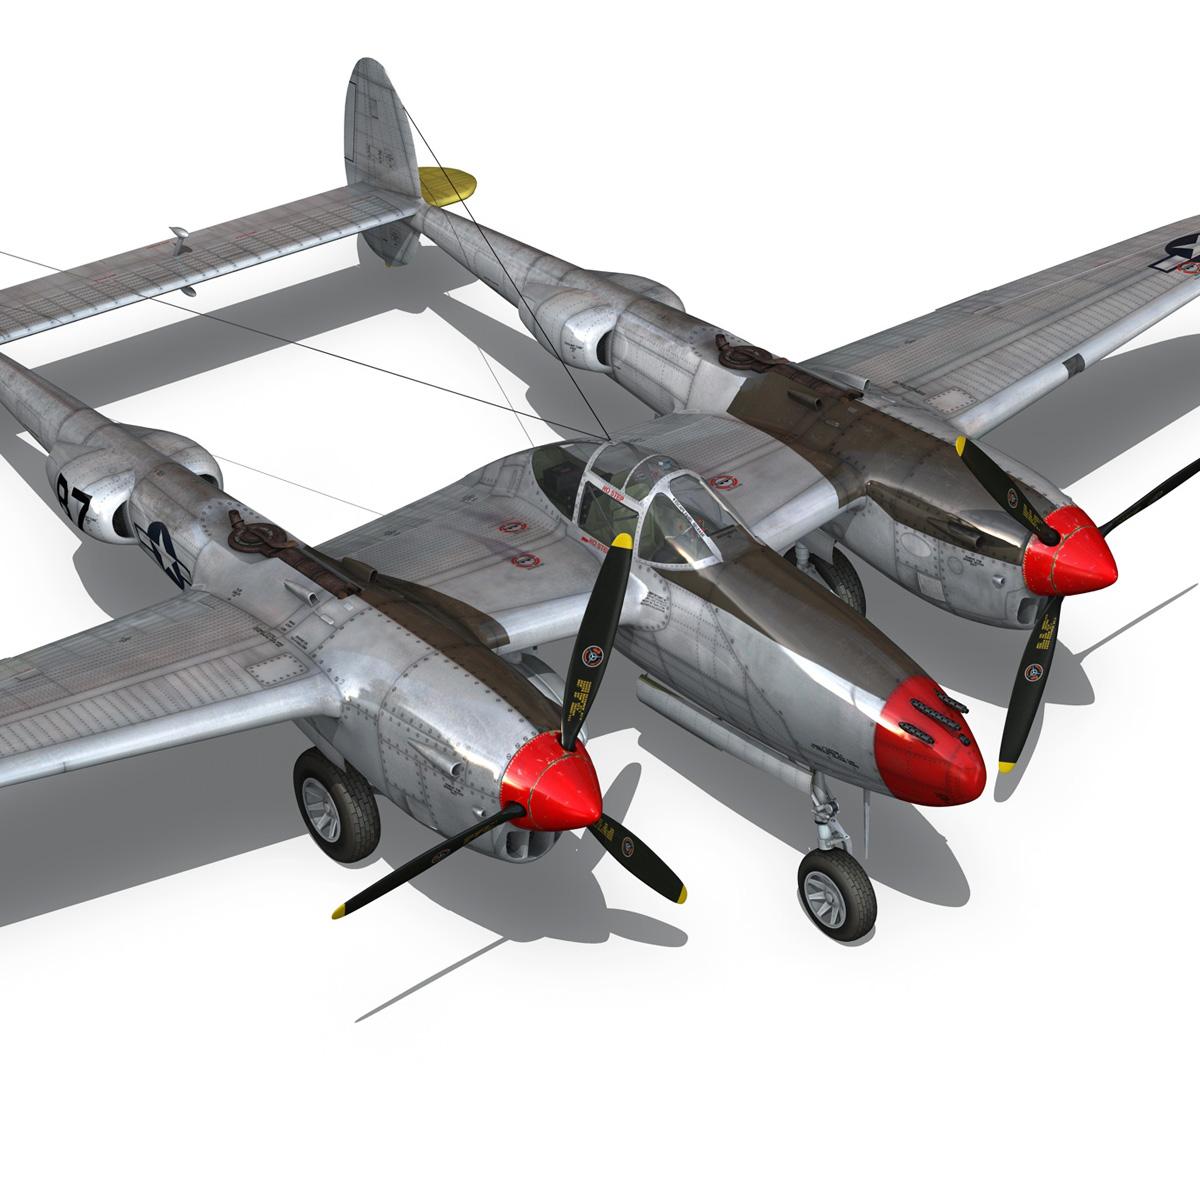 lockheed p-38 lightning – beautiful bitch 3d model fbx c4d lwo obj 272675